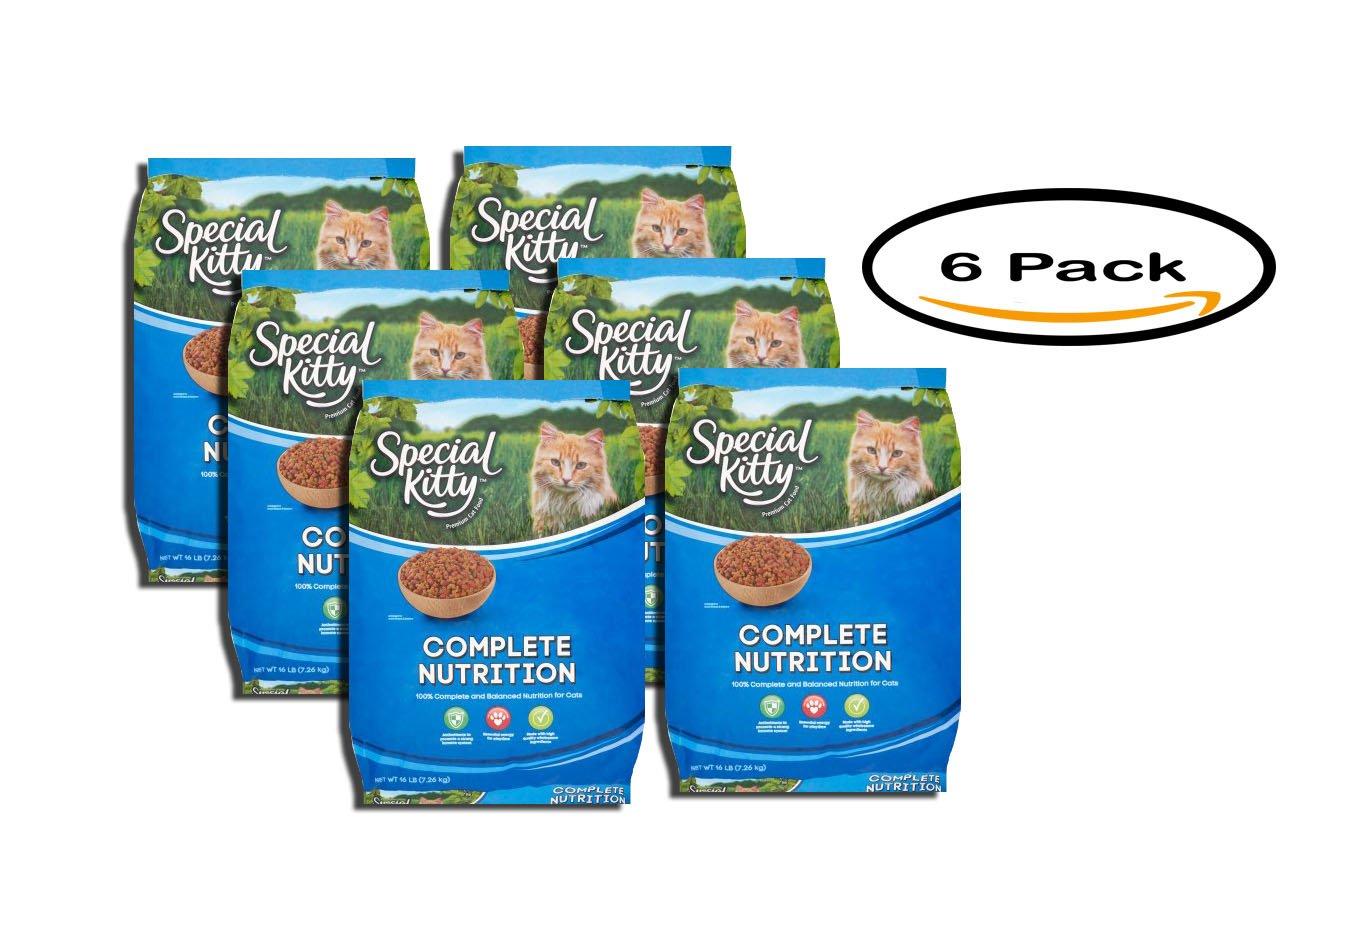 PACK OF 6 - Special Kitty Premium Original Cat Food, 16 lb